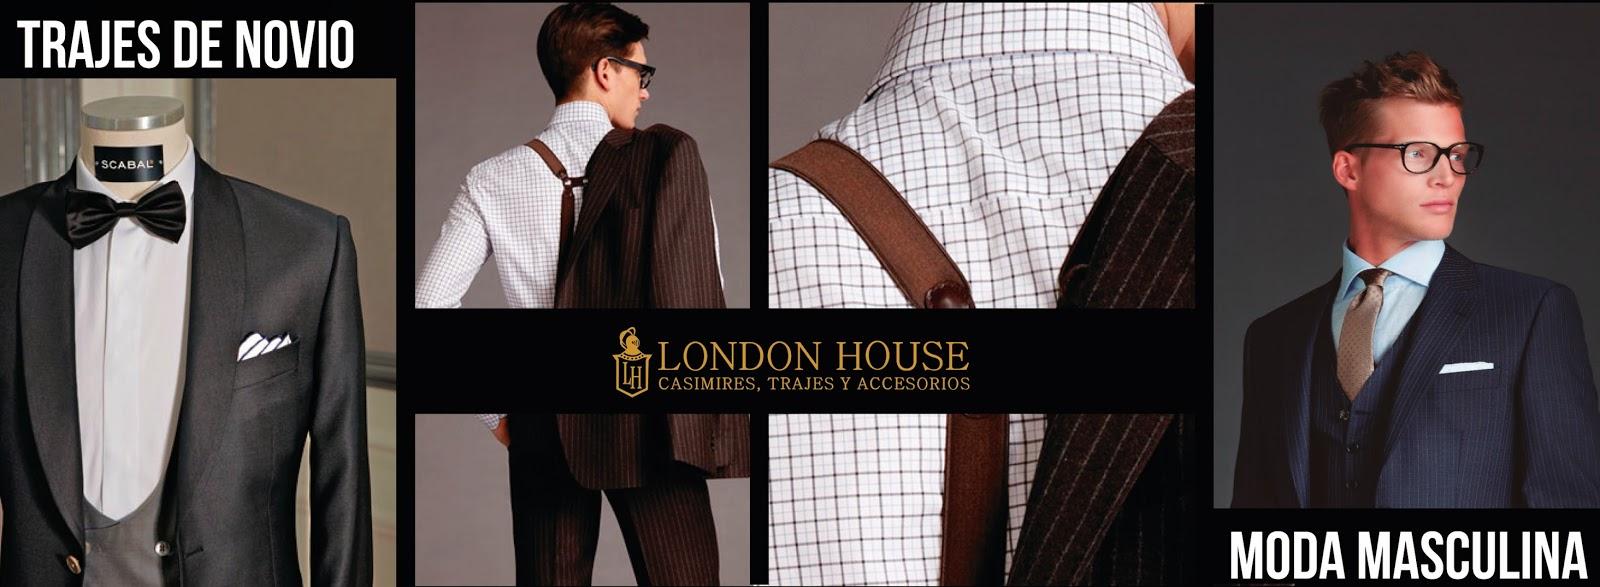 http://www.londonhousecasimires.com/